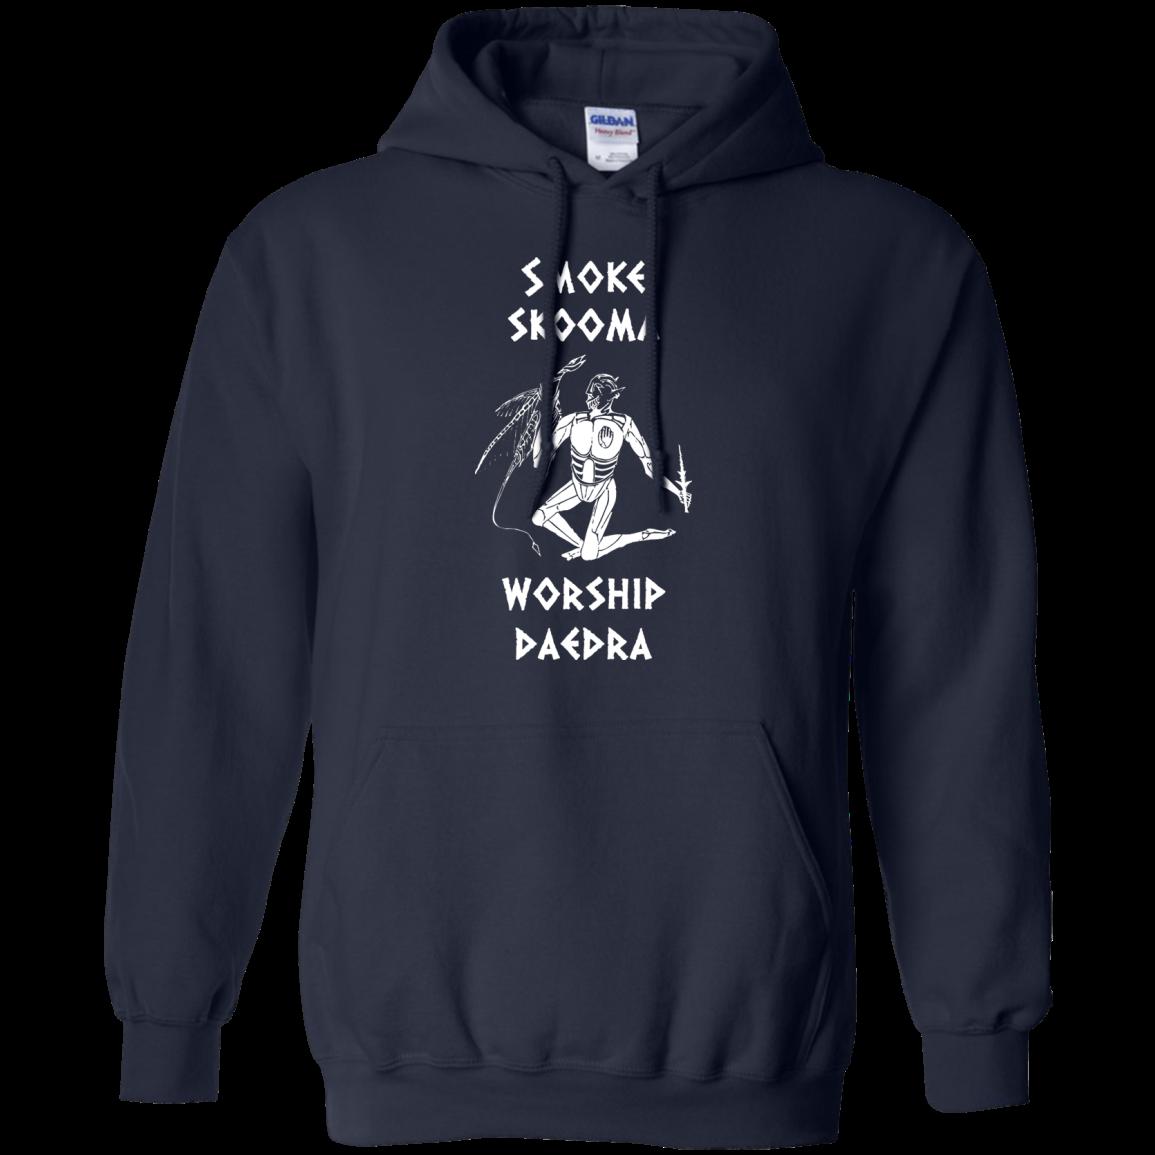 skyrim smoke skooma worship daedra unisex t shirt tank hoodie